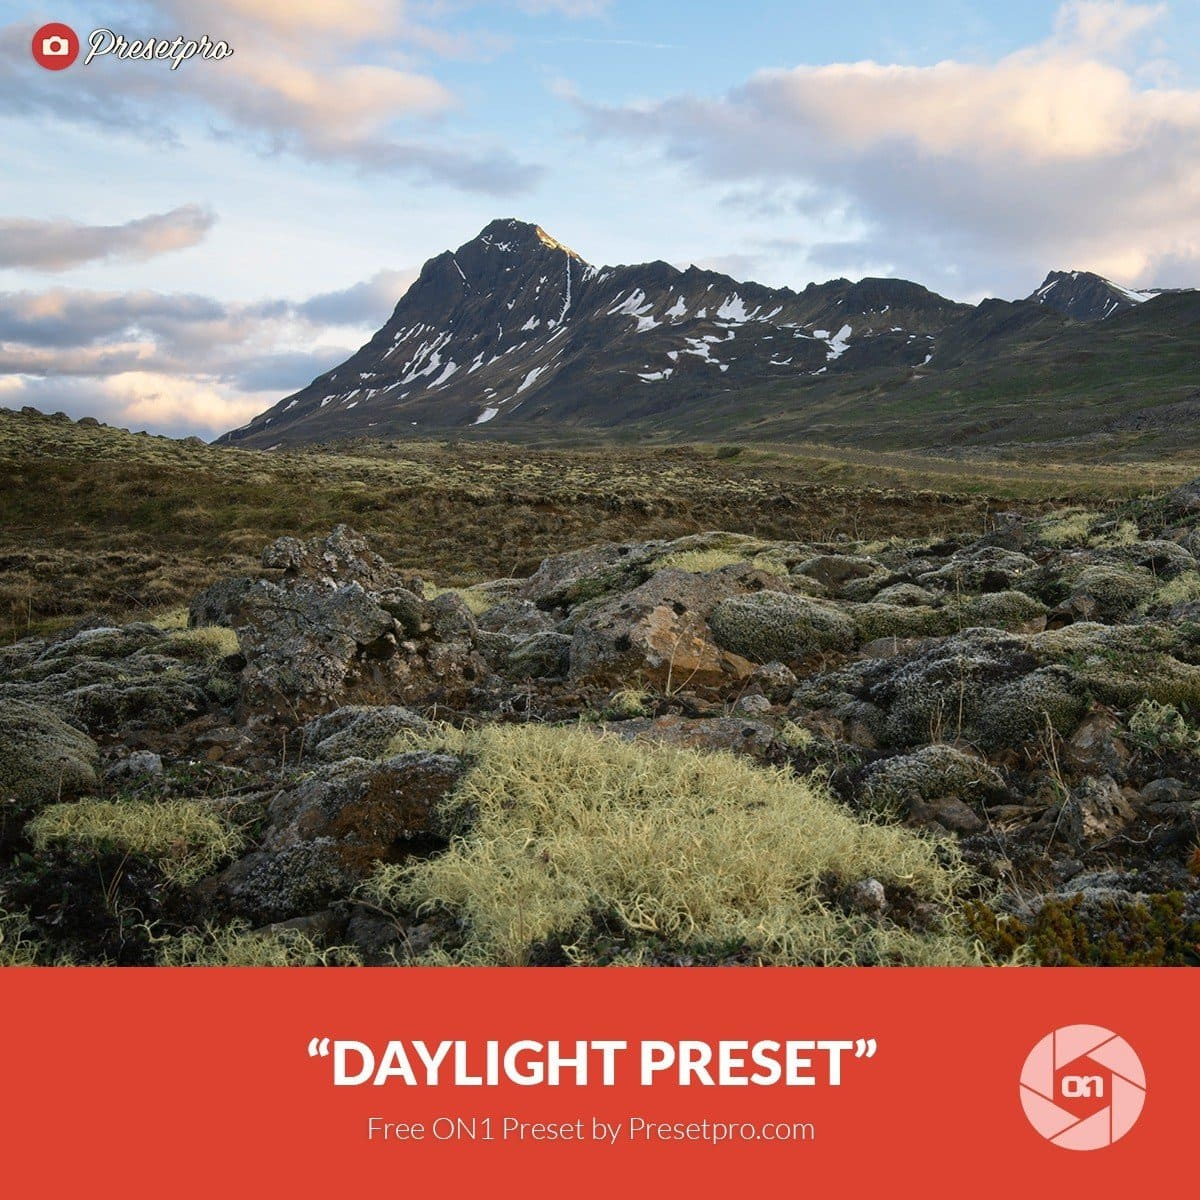 Free-On1-Preset-Daylight-Presetpro.com